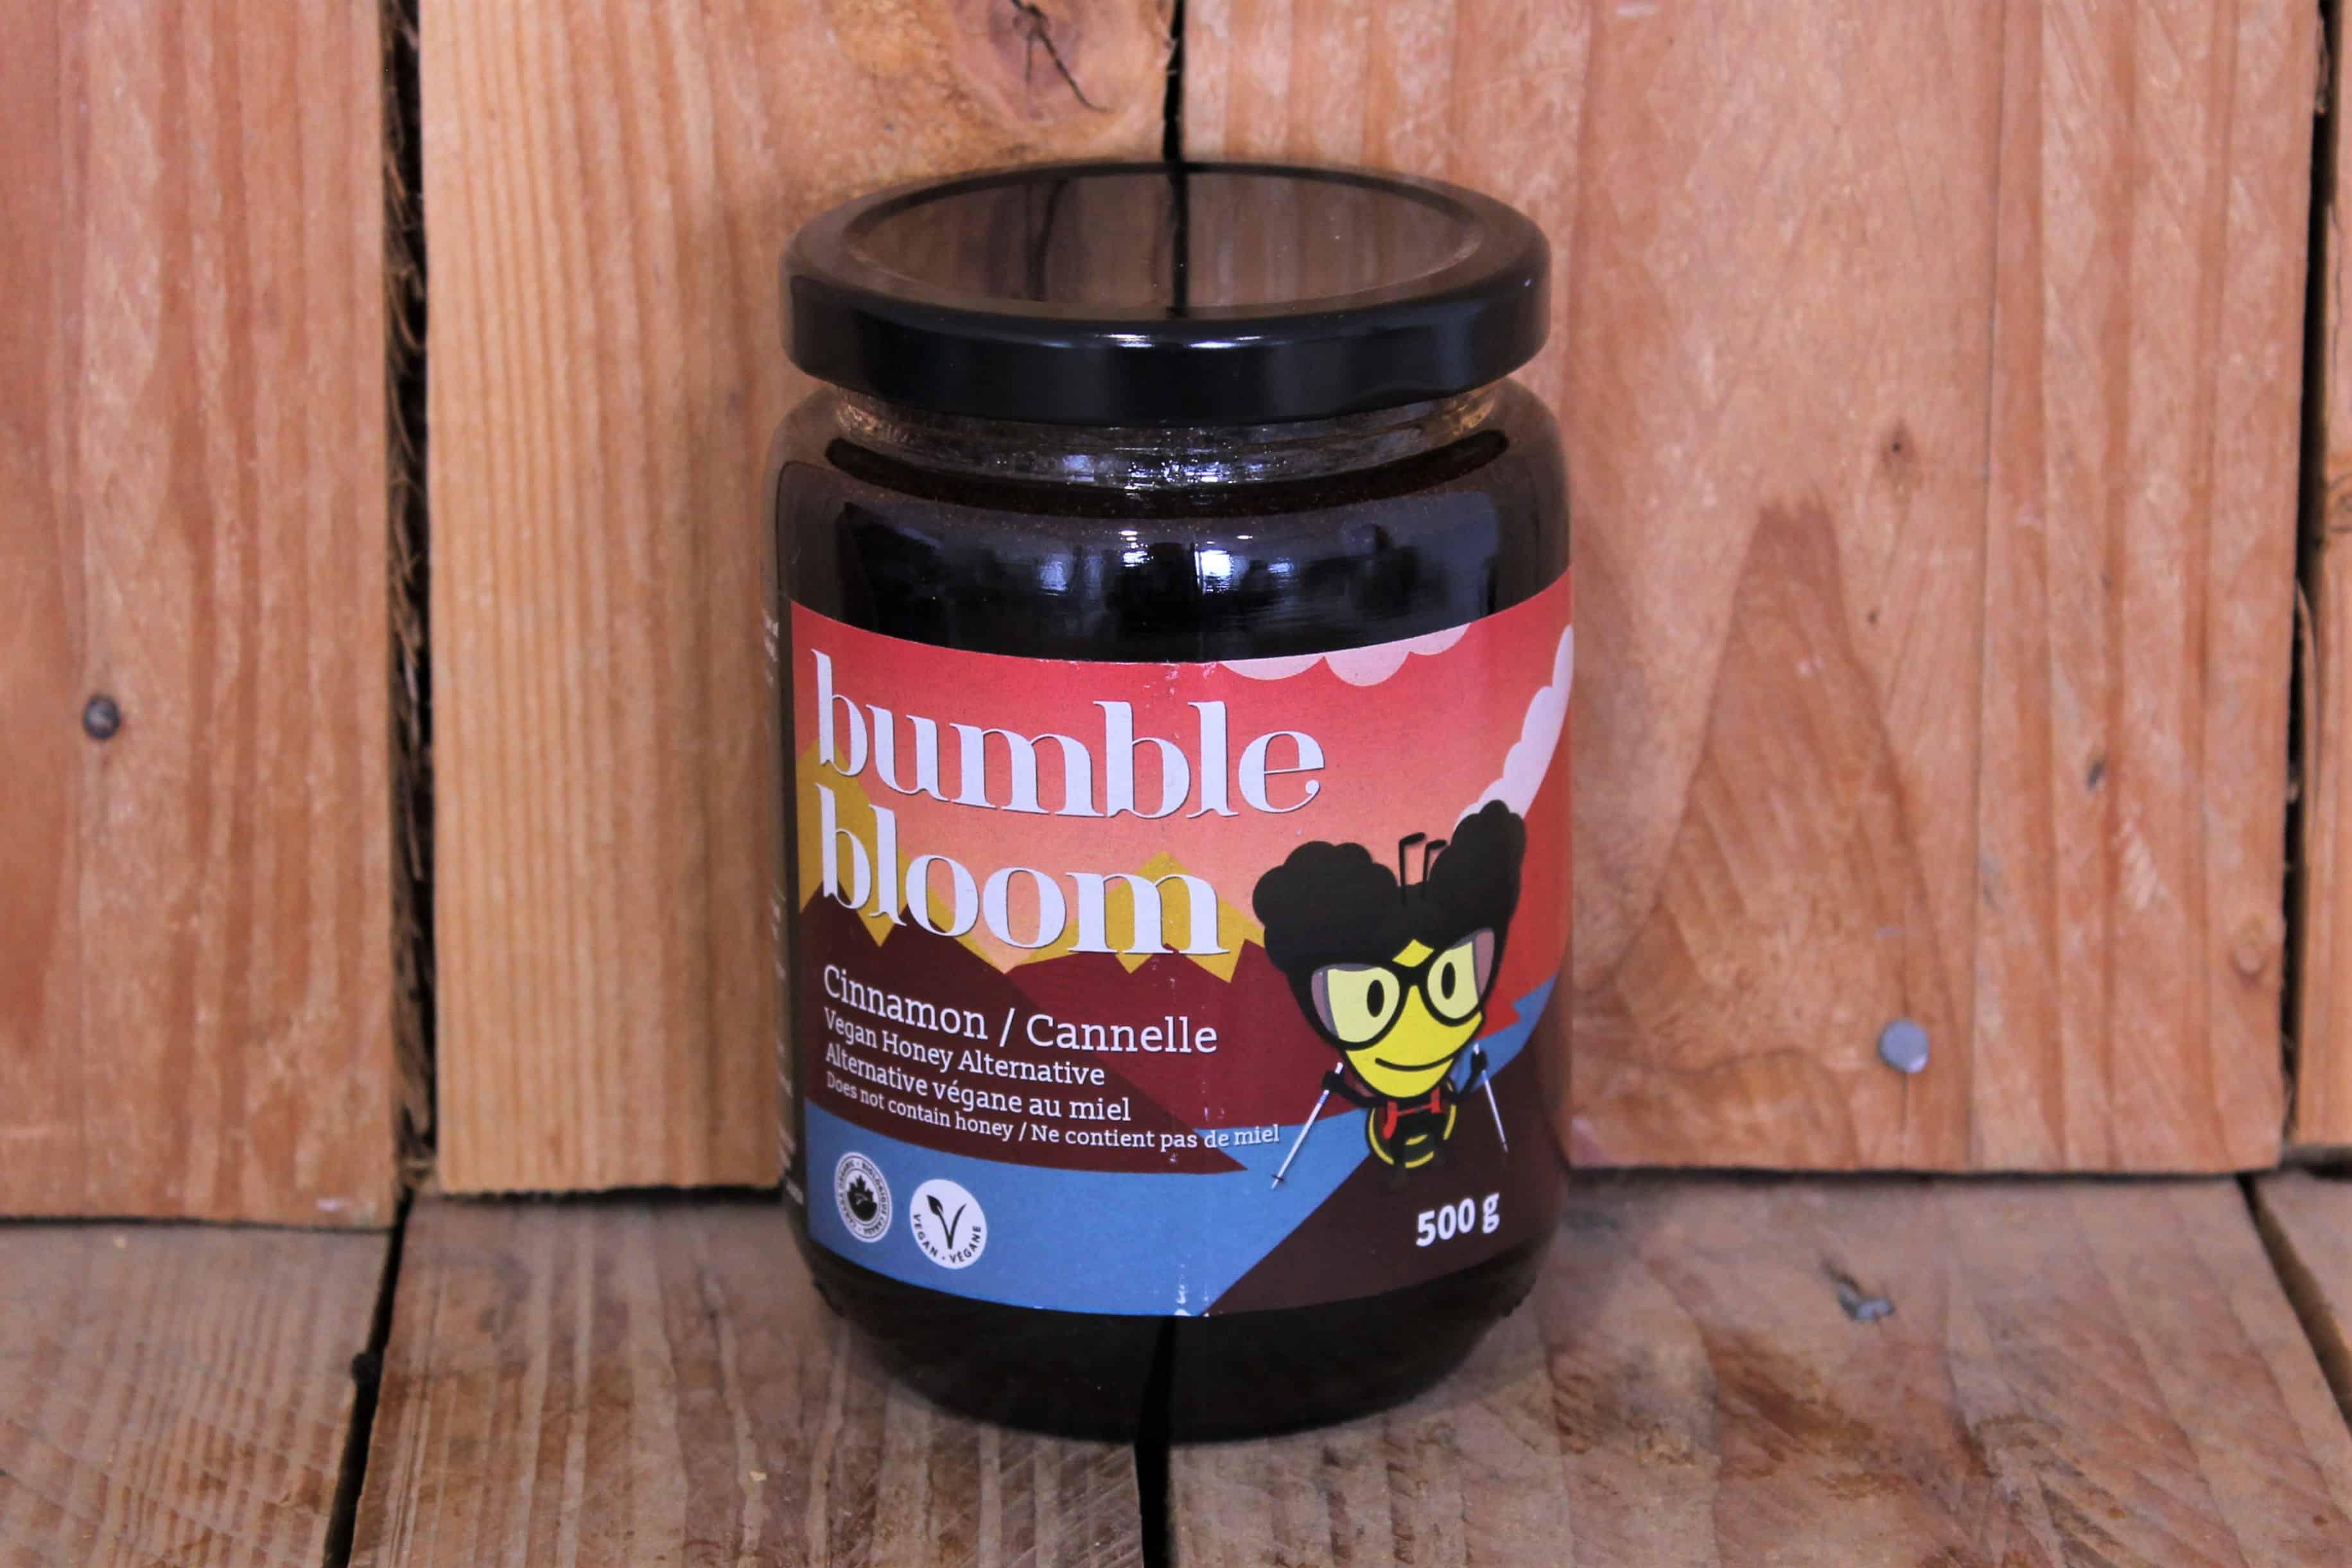 Bumble Bloom – Vegan Honey Alternative, Cinnamon (500g)